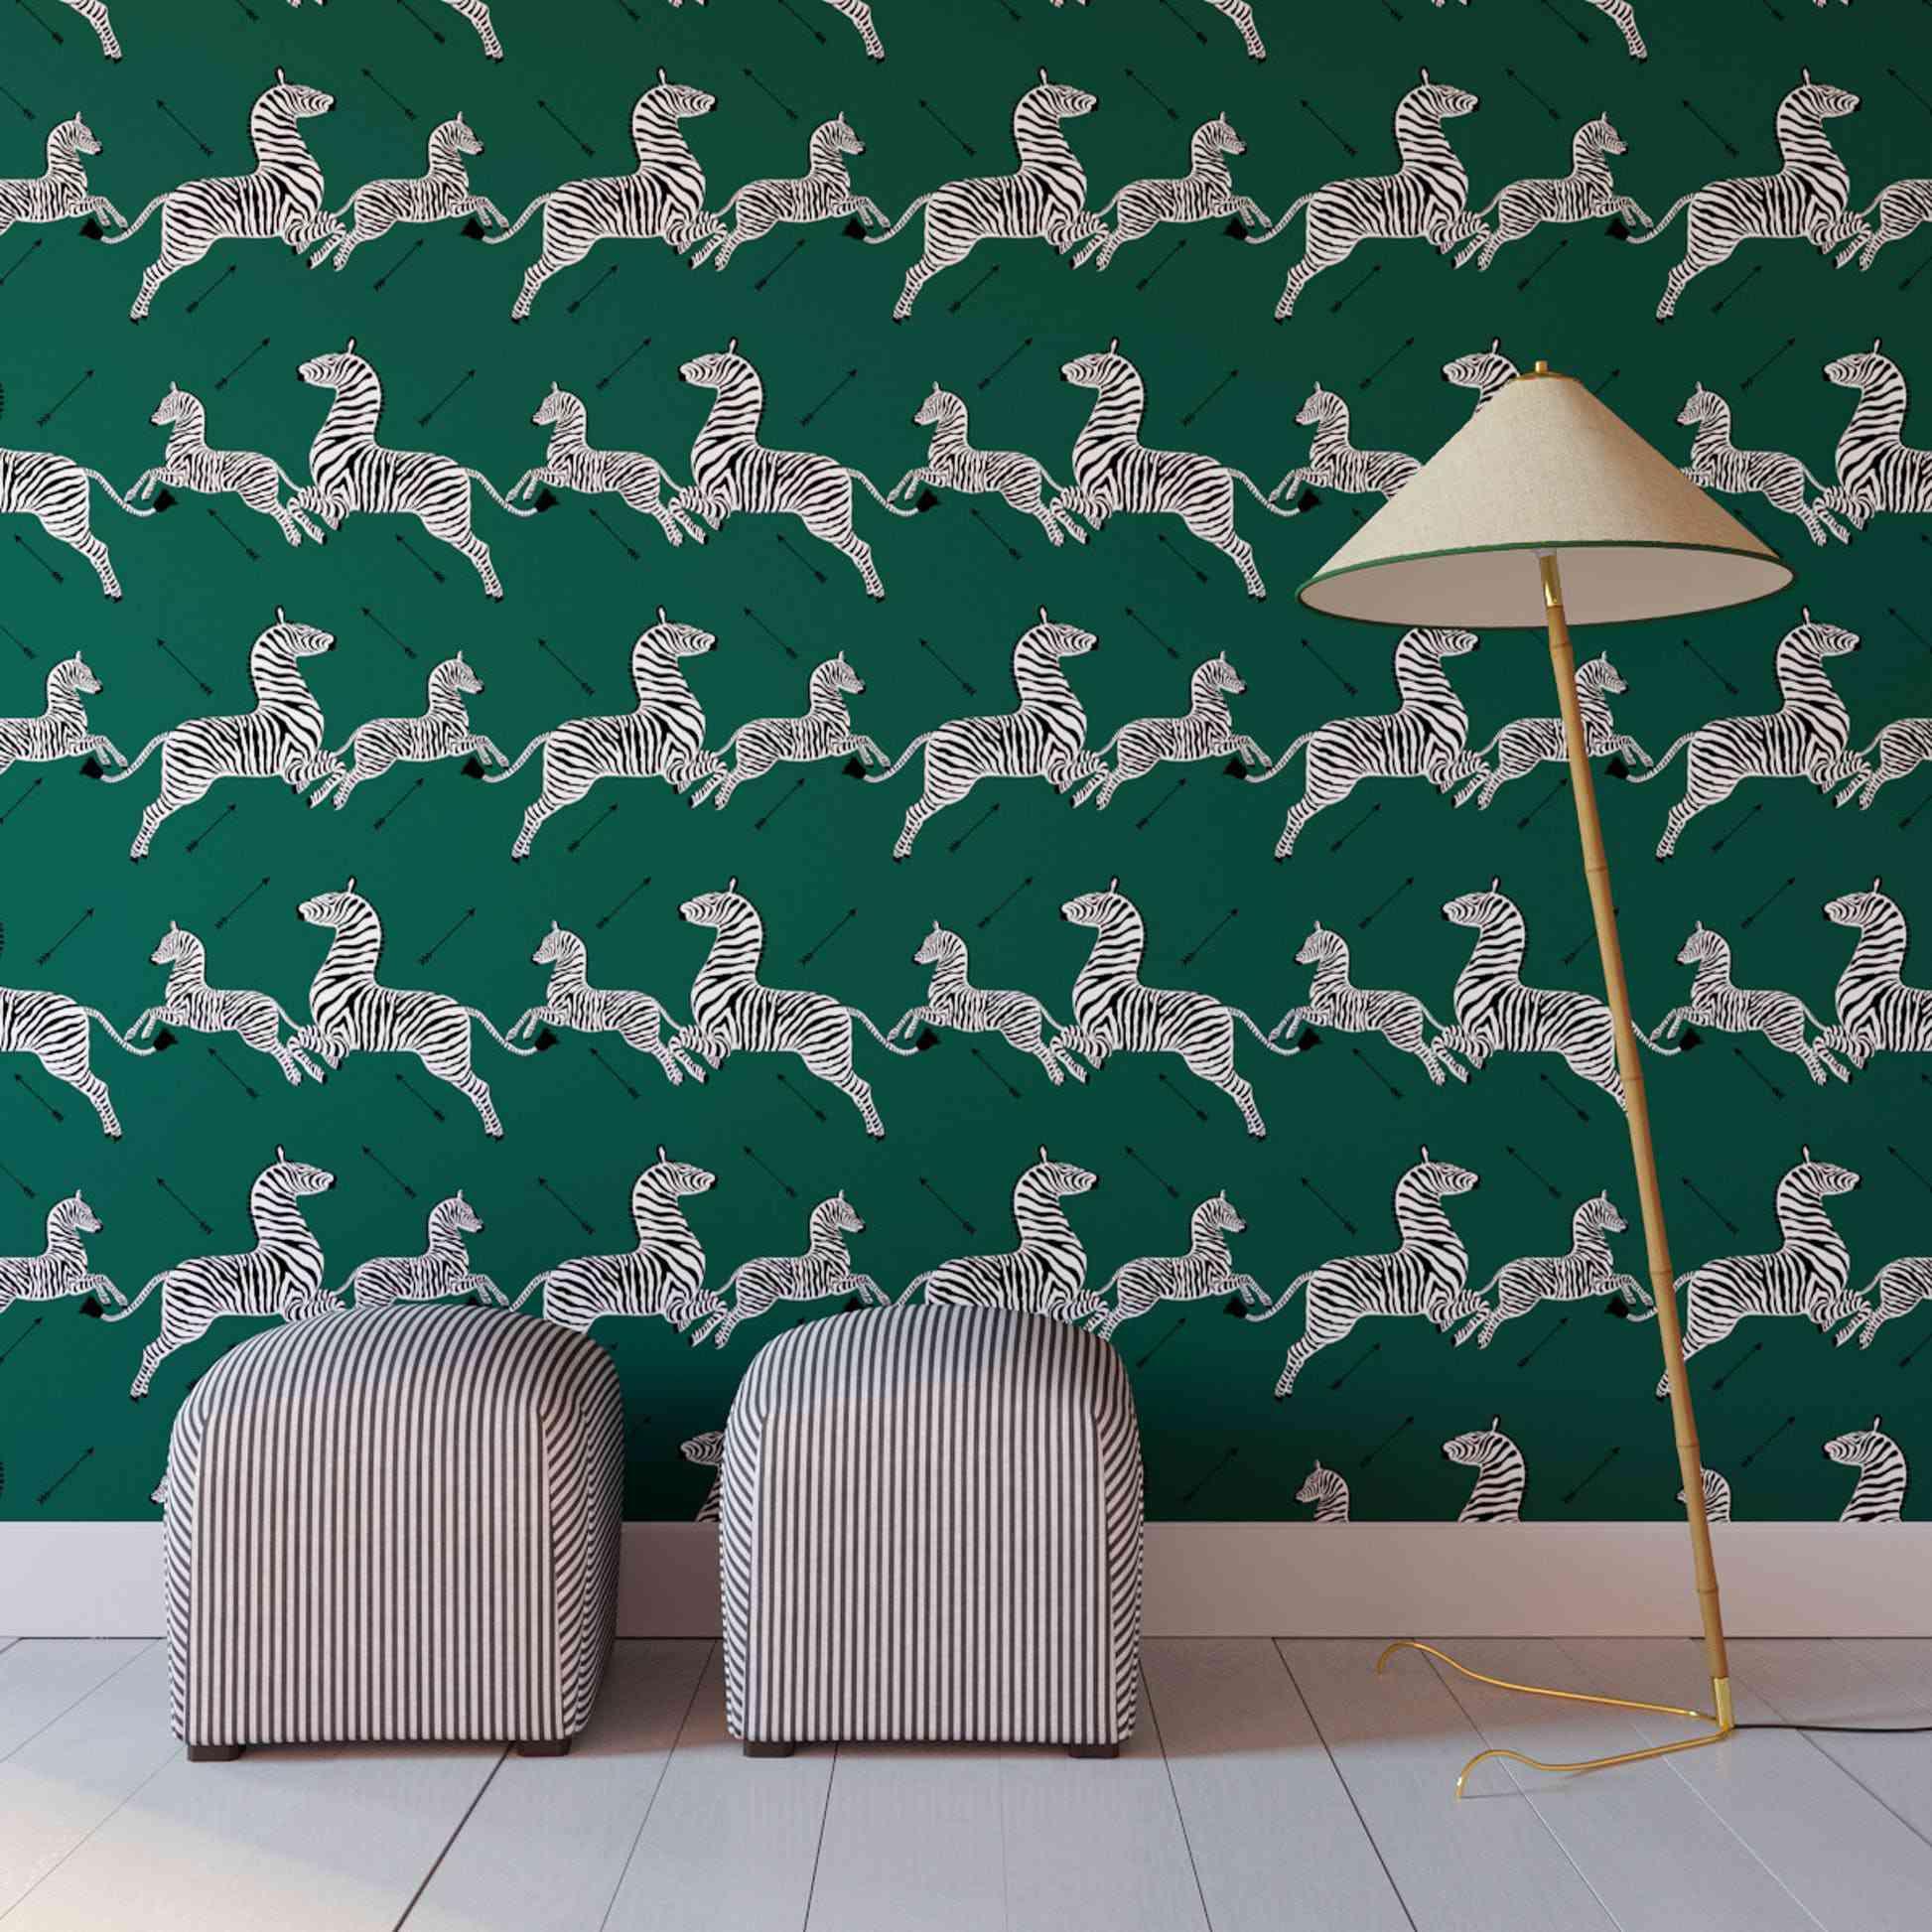 Green wallpaper covered in zebras